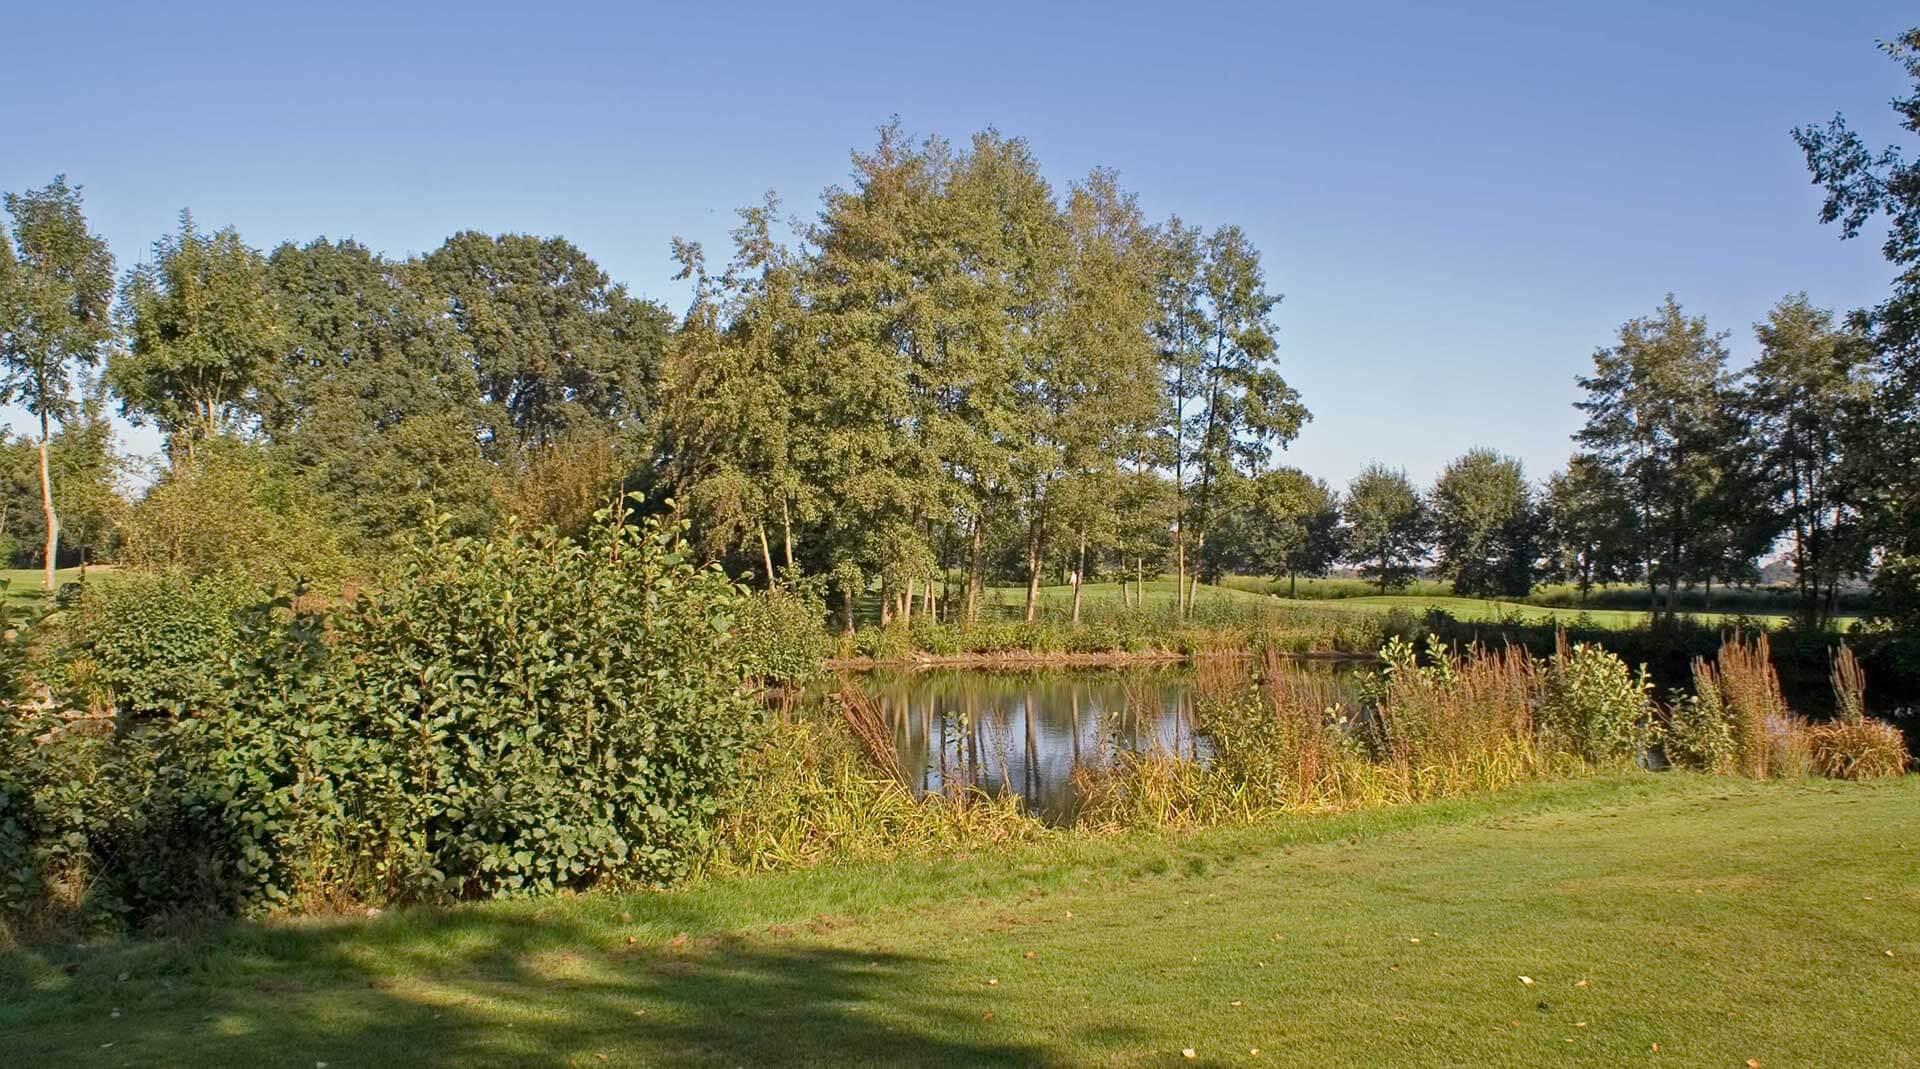 https://golfclub-peckeloh.de/wp-content/uploads/2018/02/PICT0259-3.jpg